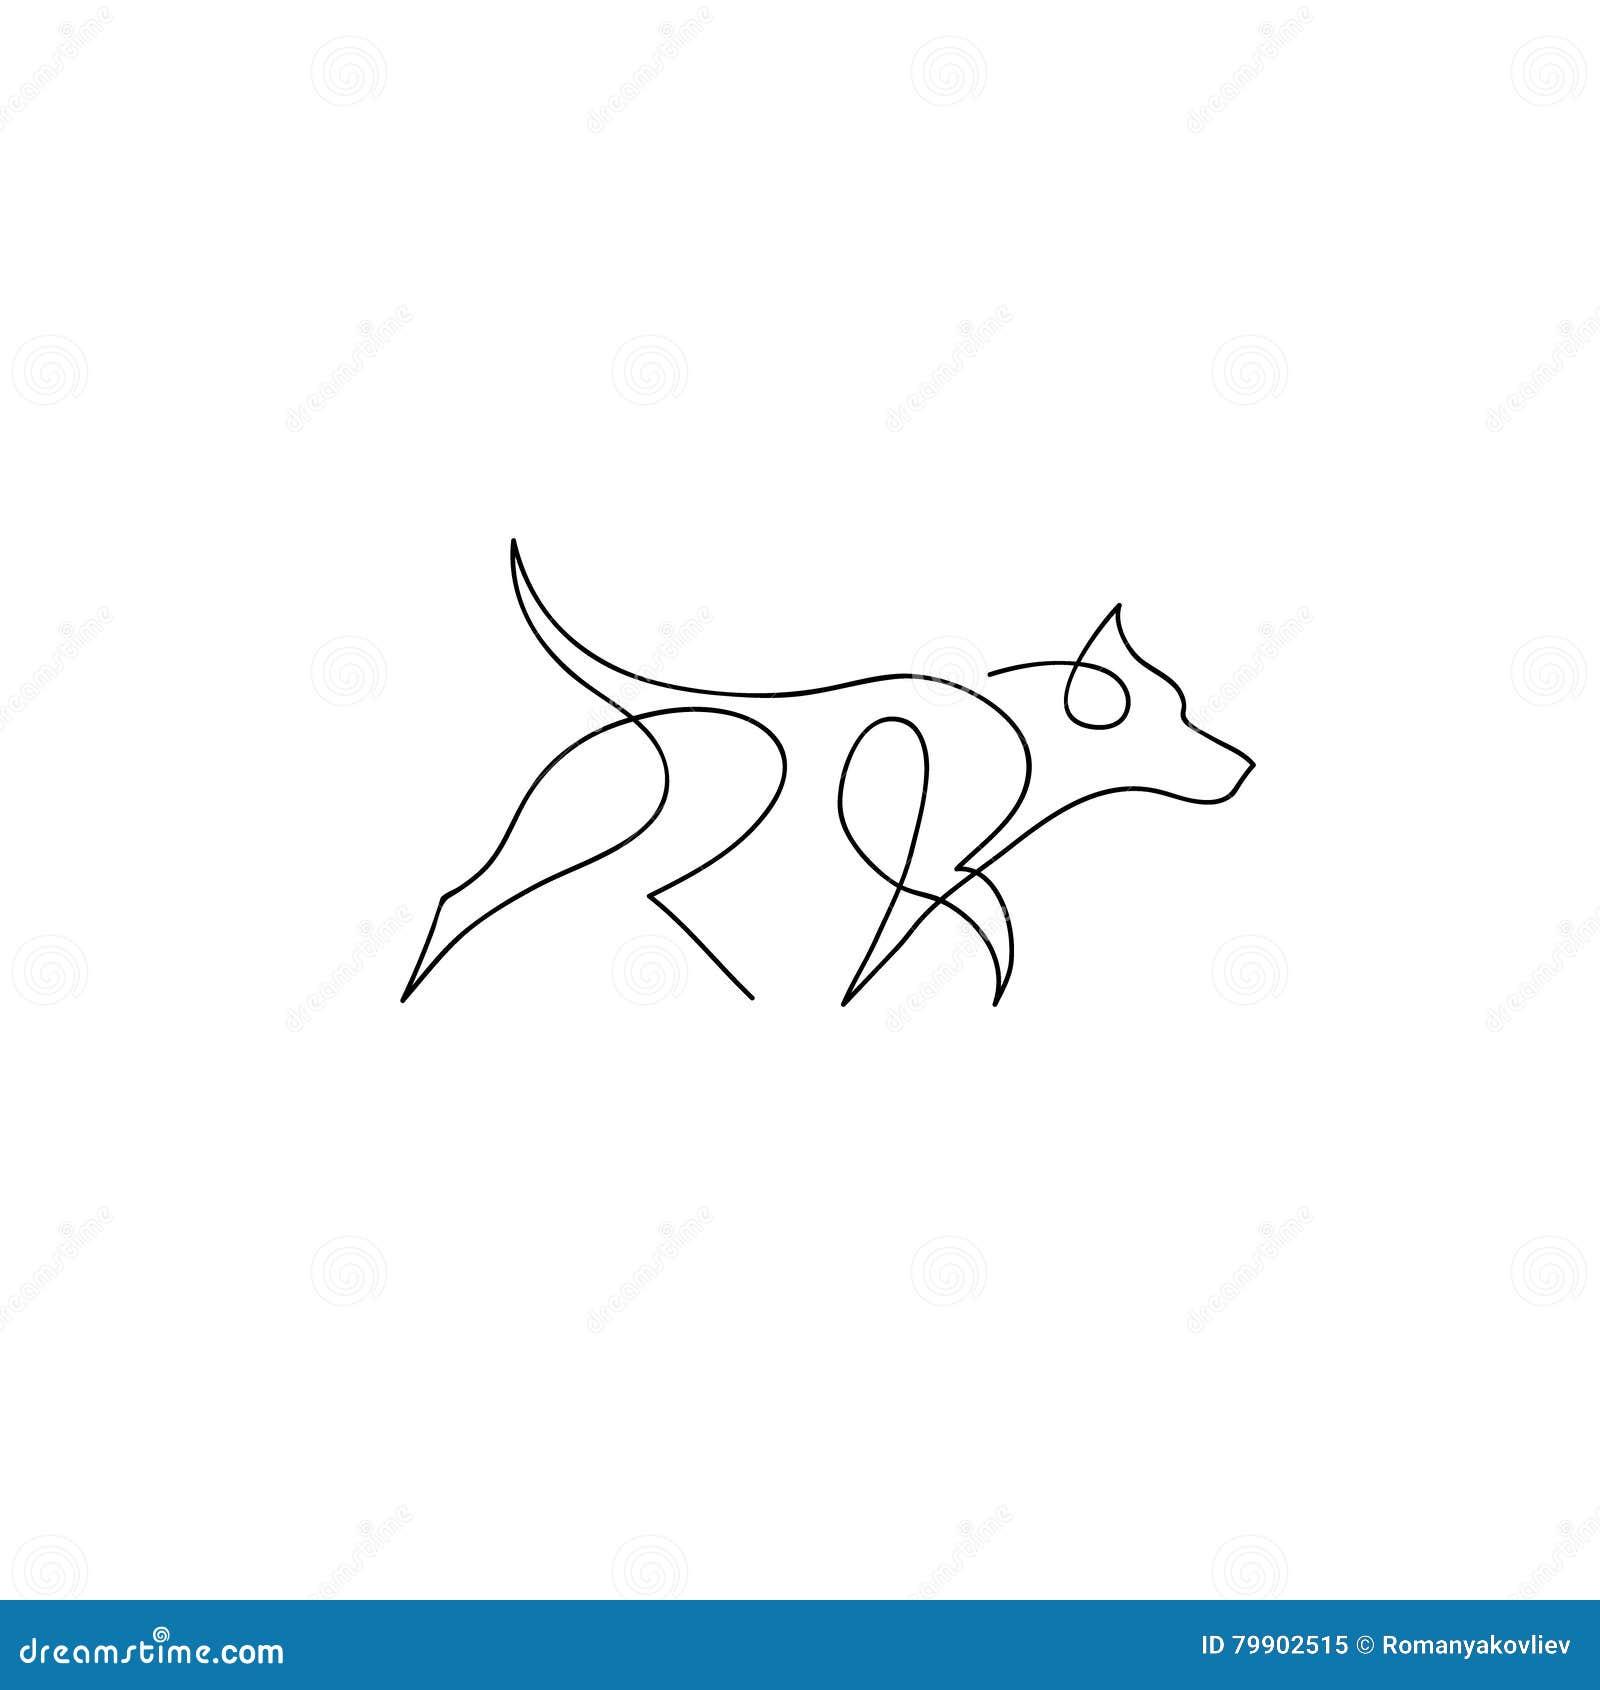 One Line Art Facepalm : One line dog design silhouette german shepherd hand